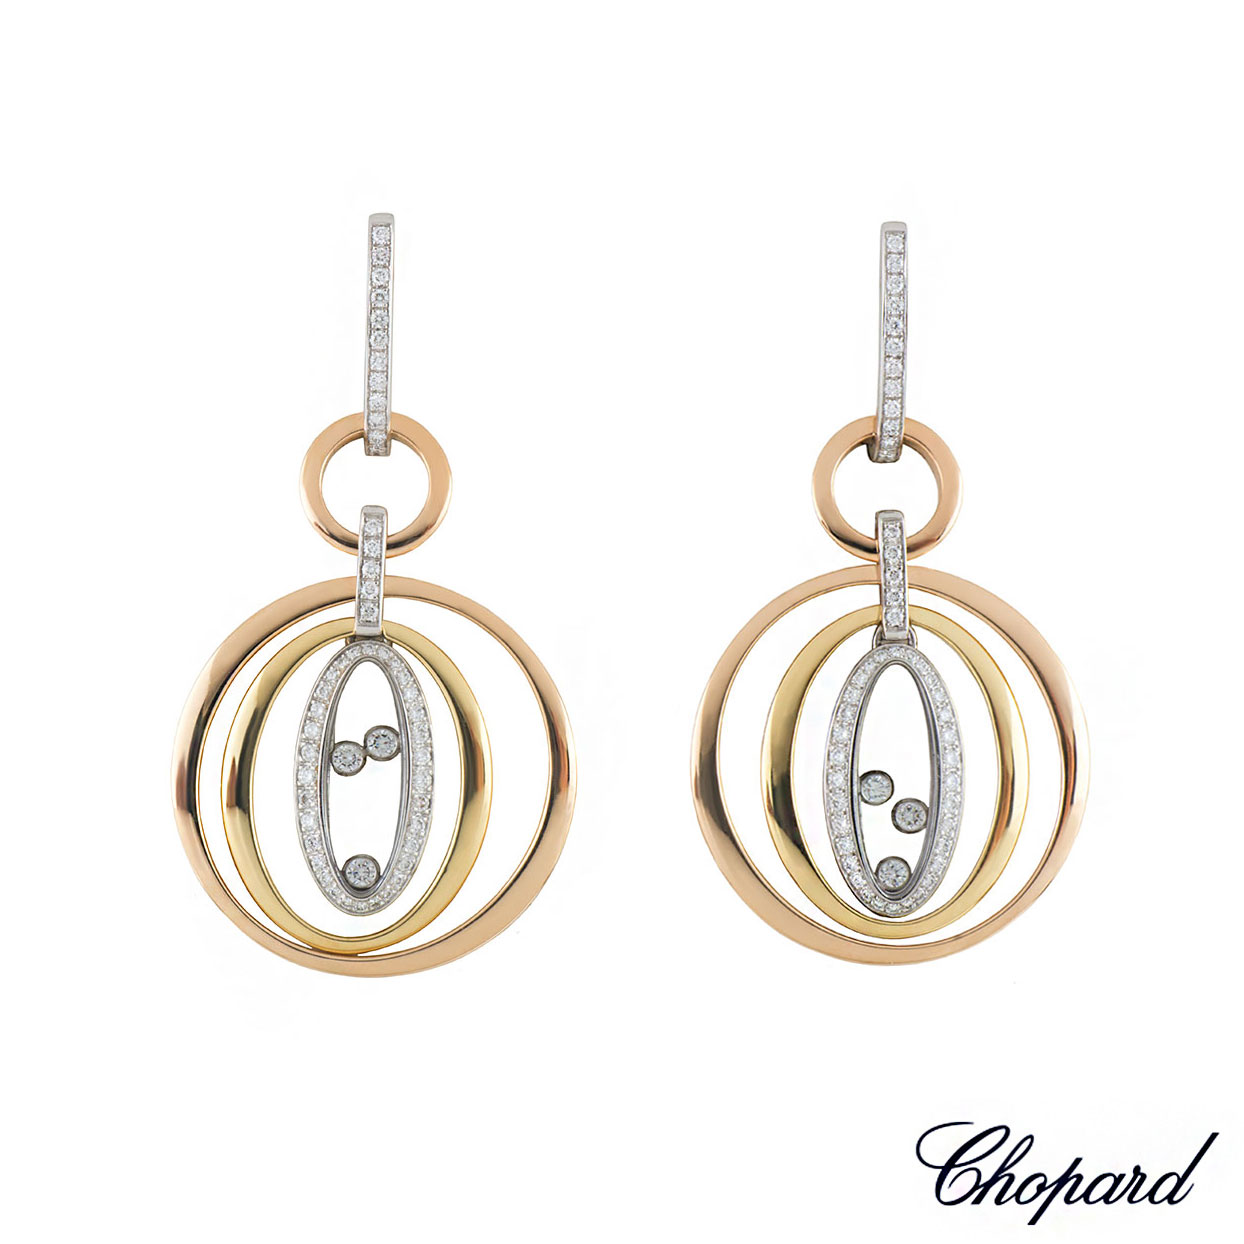 Chopard Tri-Colour Happy Diamonds Earrings 849432-9001